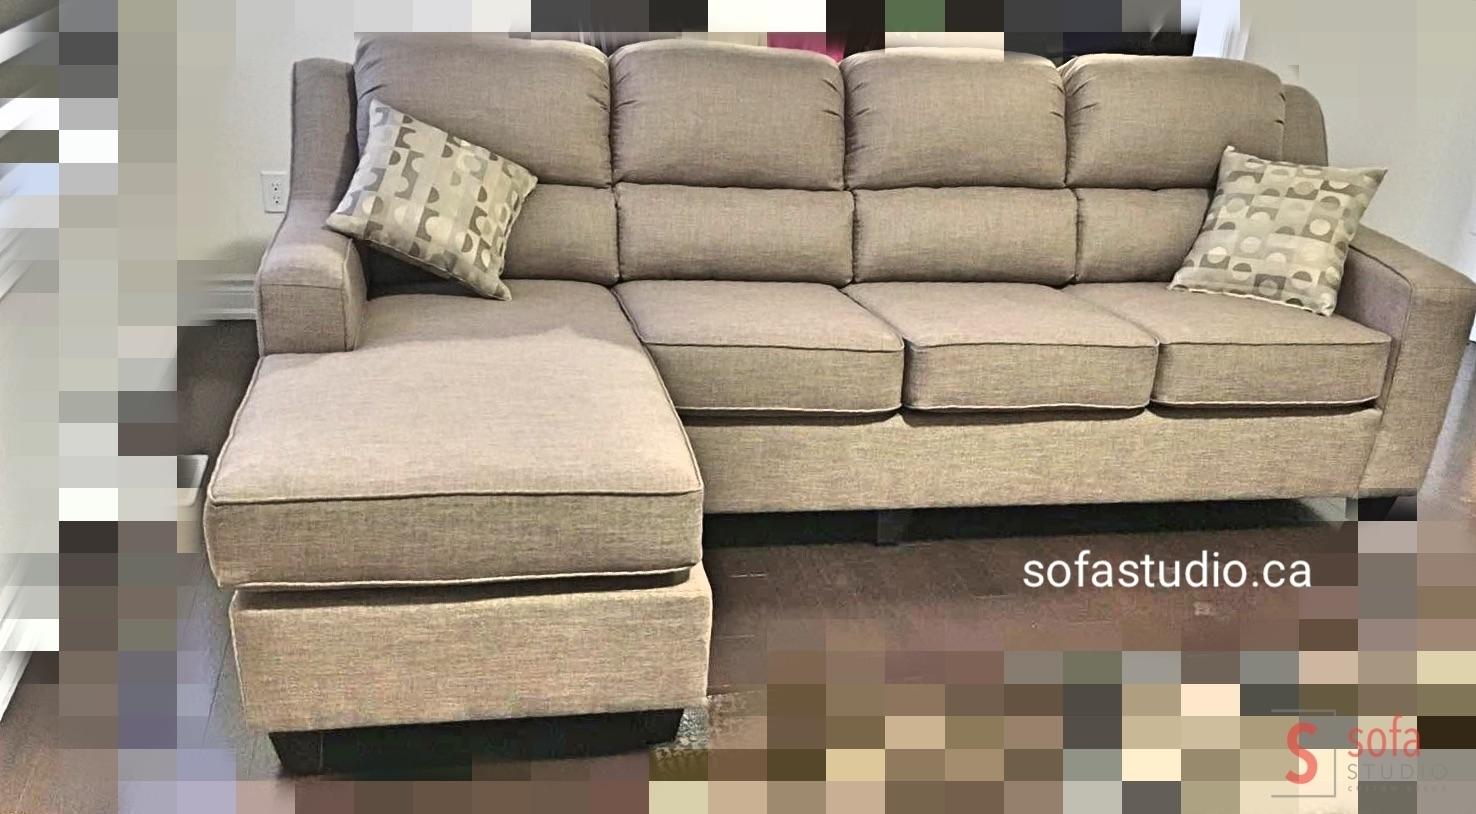 Modern Sofa Design In Leather , Sofa Factory Brampton , Custom With Regard To Sectional Sofas At Brampton (Image 6 of 10)